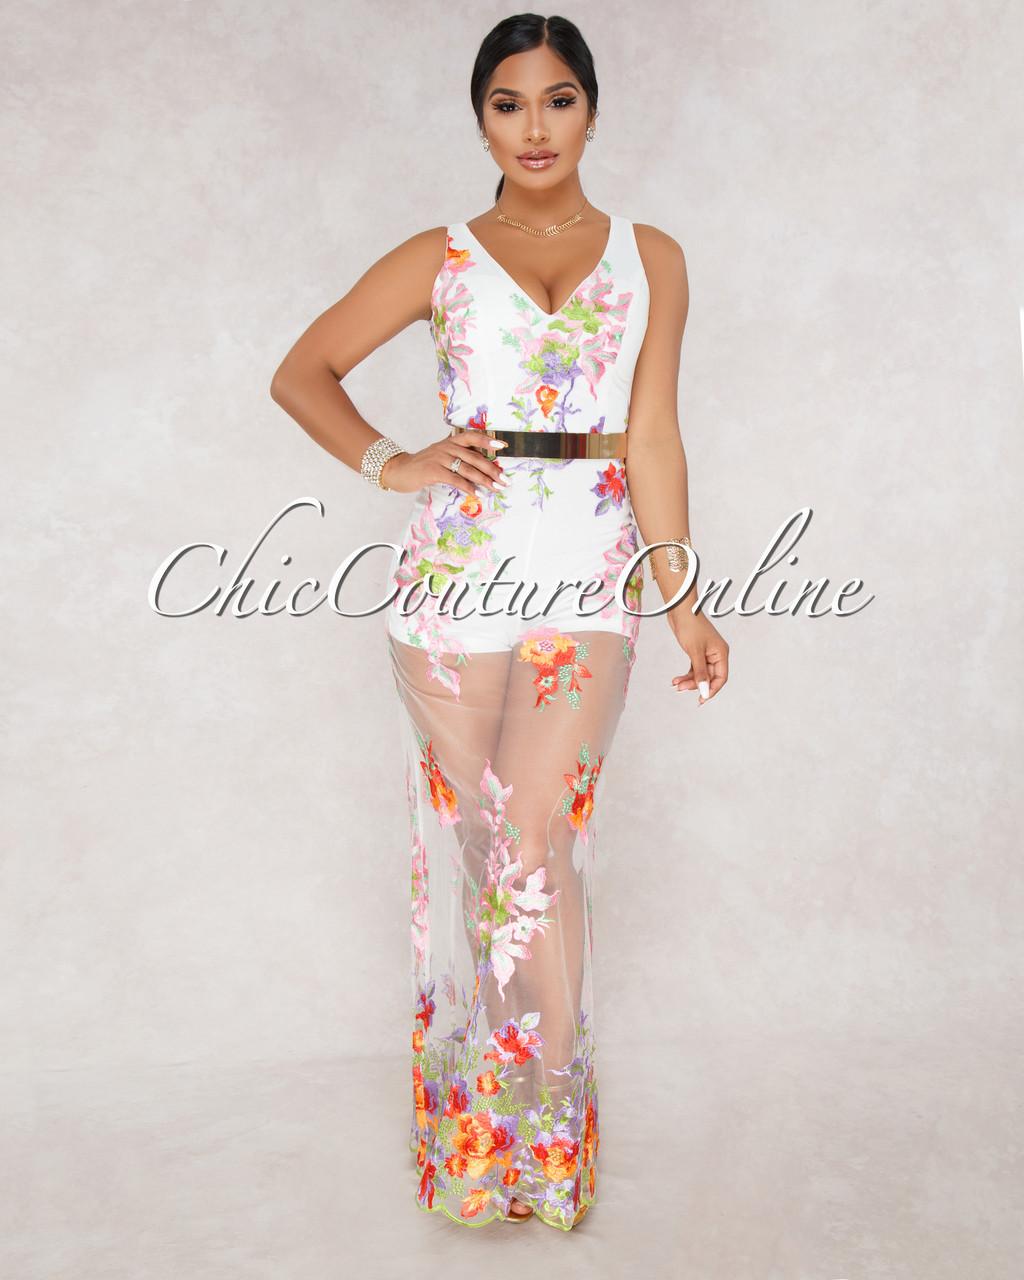 4ef655fc145 Venetia White Multi Color Embroidery Floral Romper Dress. Price   65.00.  Image 1